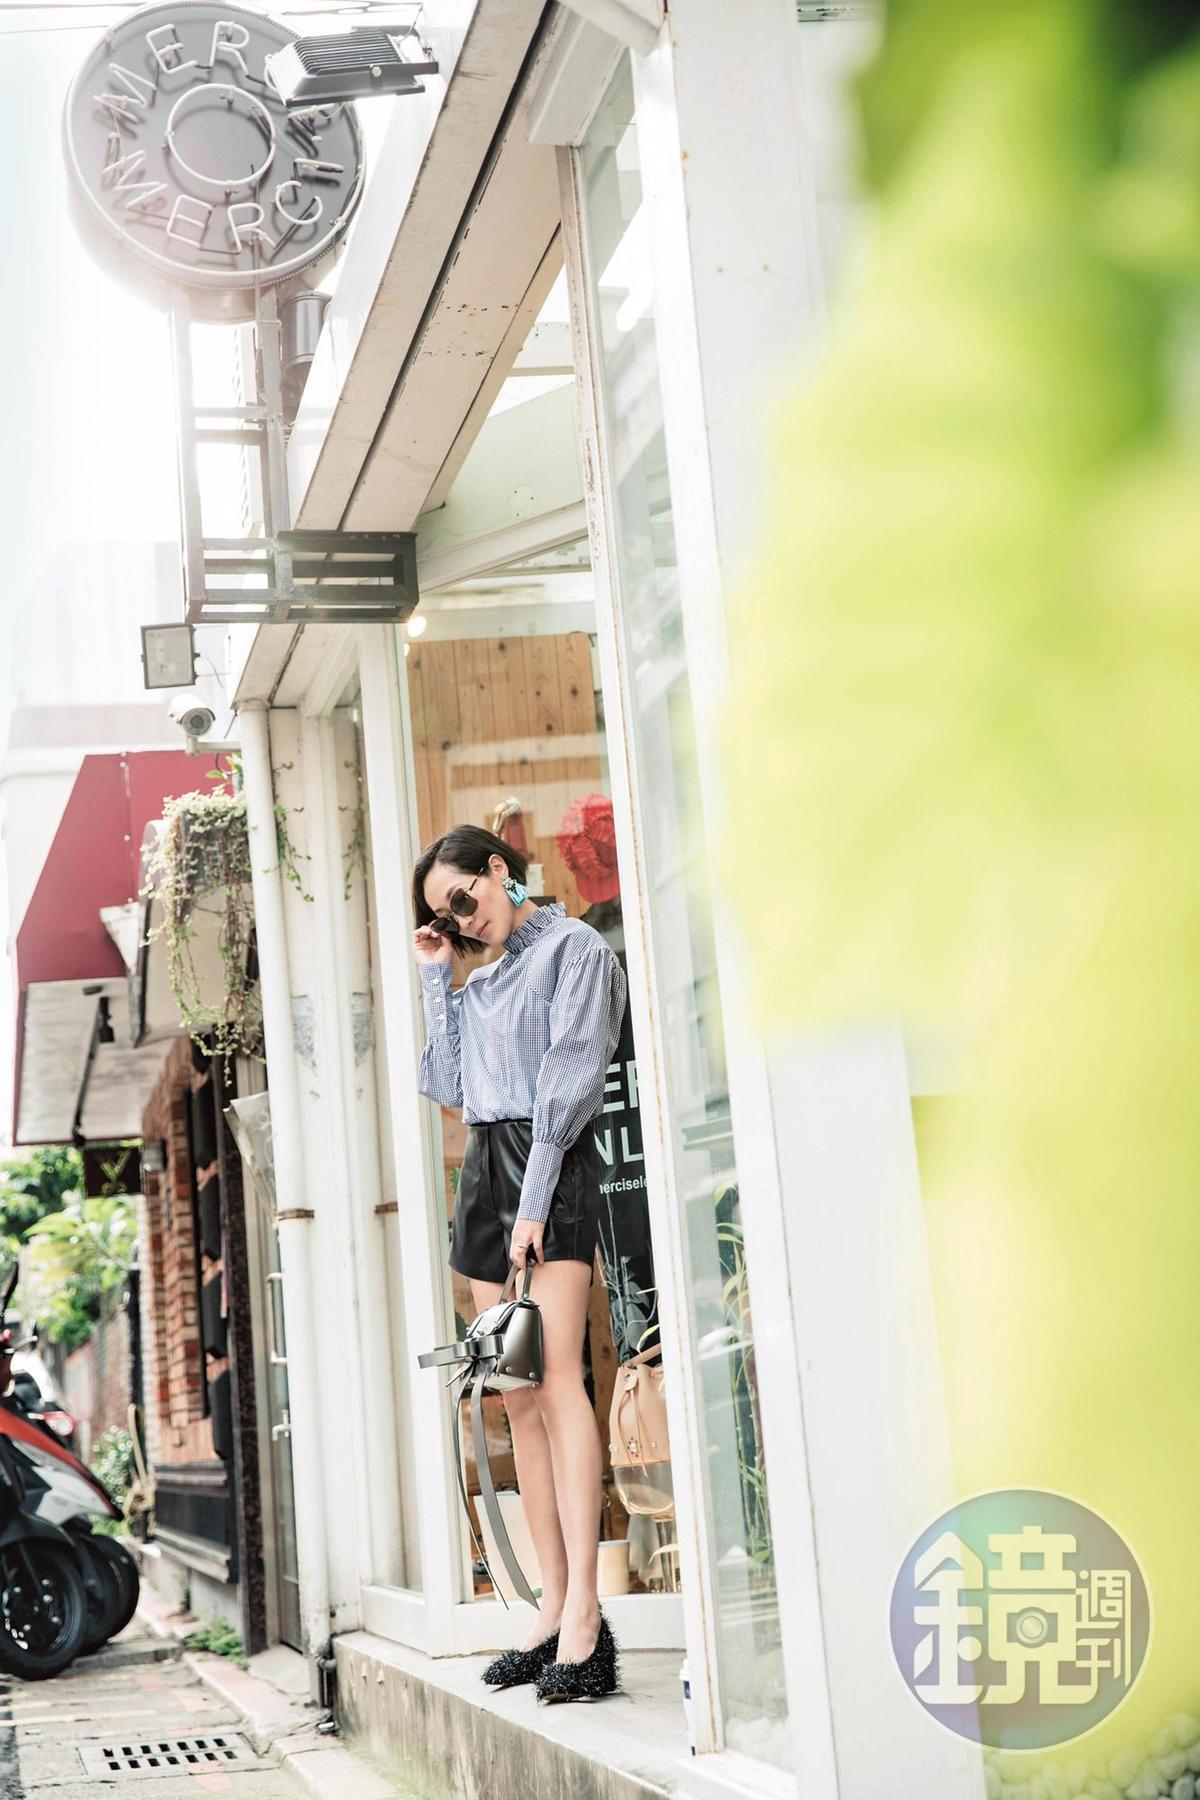 Shushu/Tong條紋襯衫。NT$17,580/Nanushka黑色皮短褲。NT$11,780/韓國設計師品牌Suecomma Bonnie毛毛跟鞋。NT$10,480